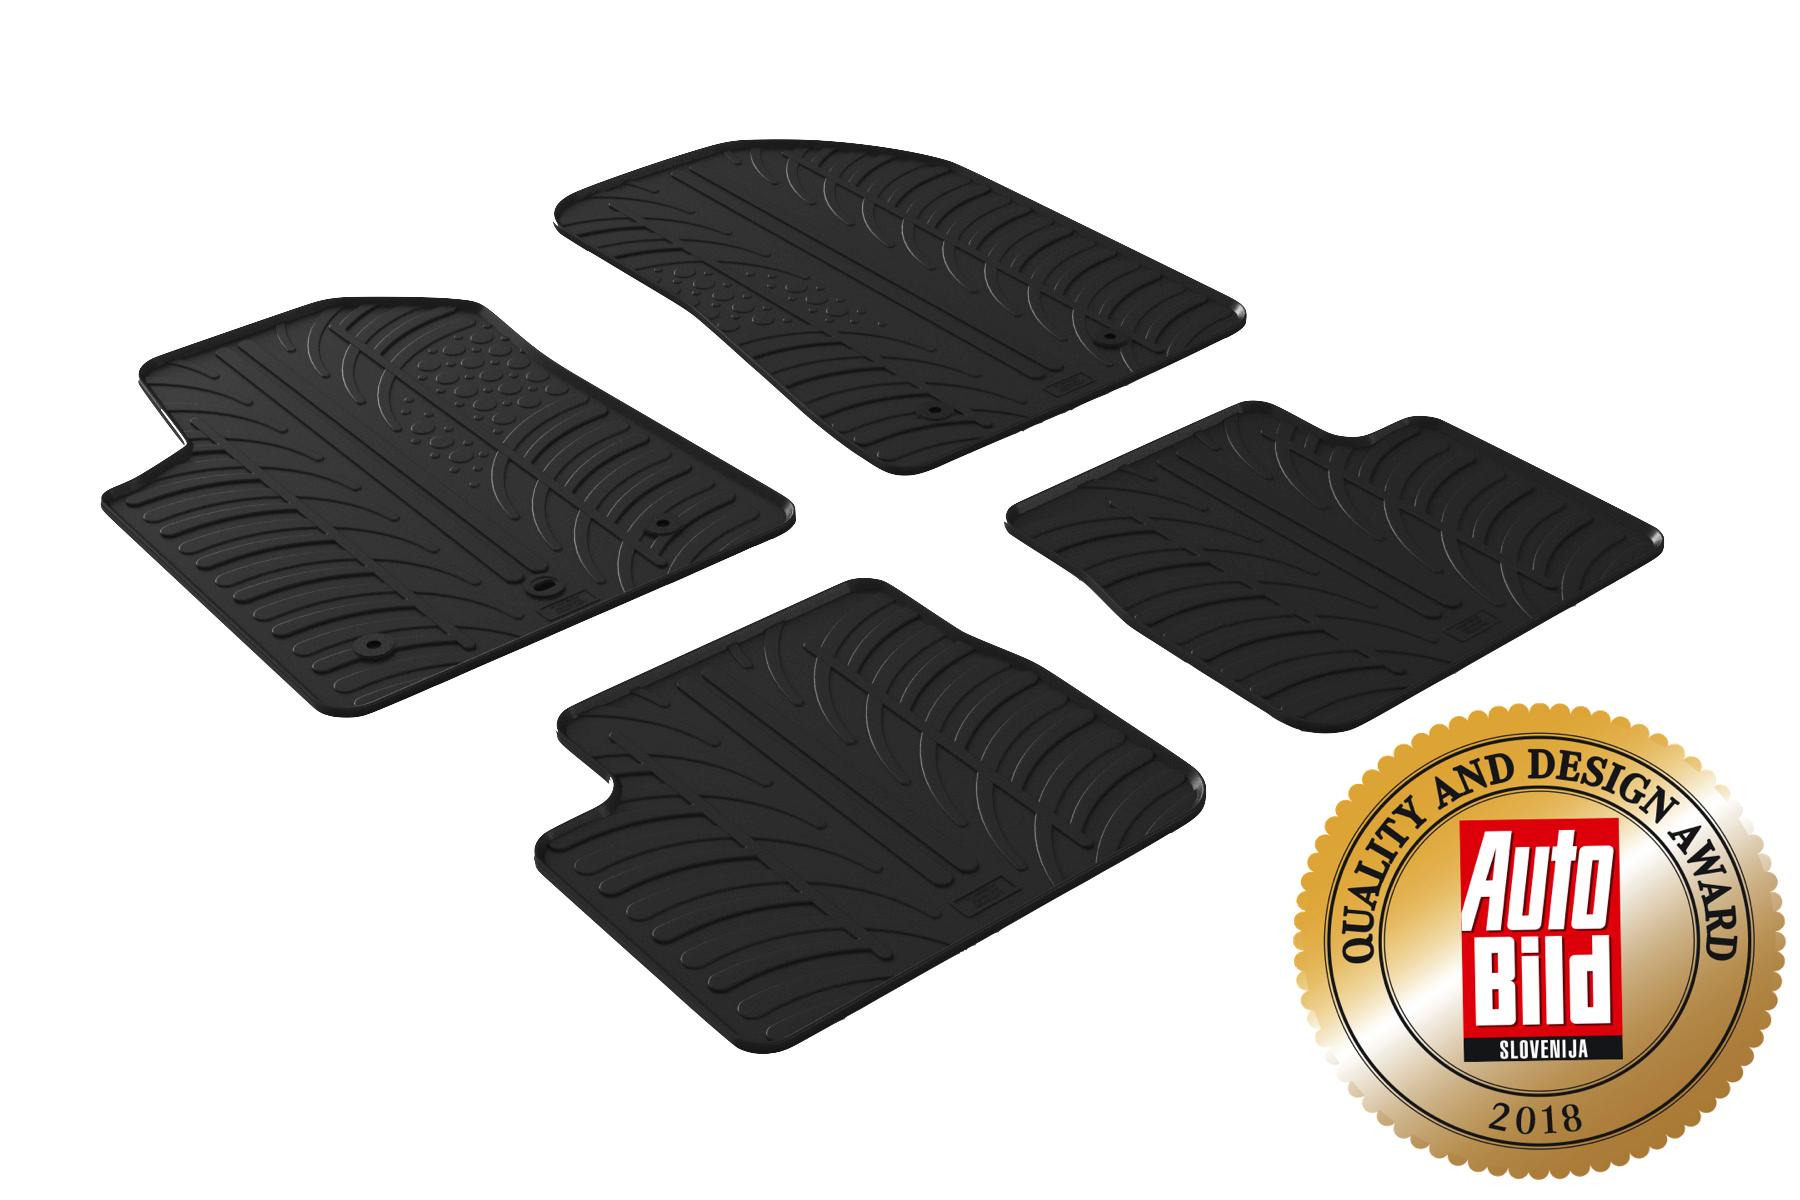 Design Passform Gummimatten Gummi Fußmatten Alfa Romeo Giulia auch Quadrifoglio